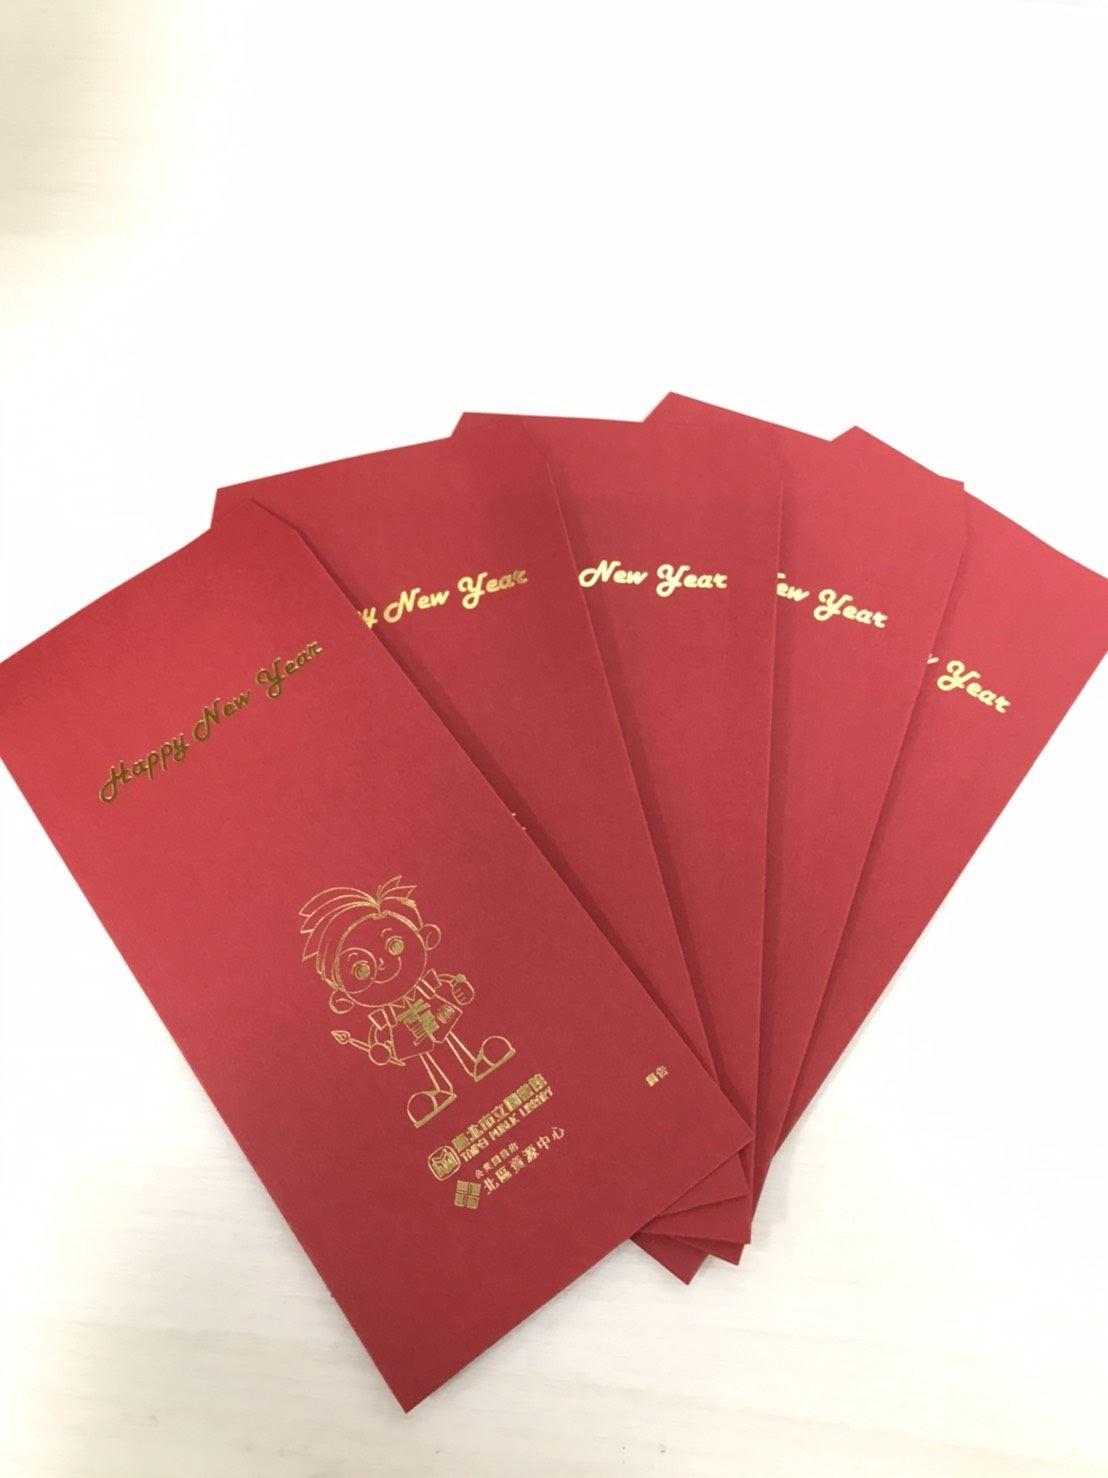 Limited Aishuya red envelopes